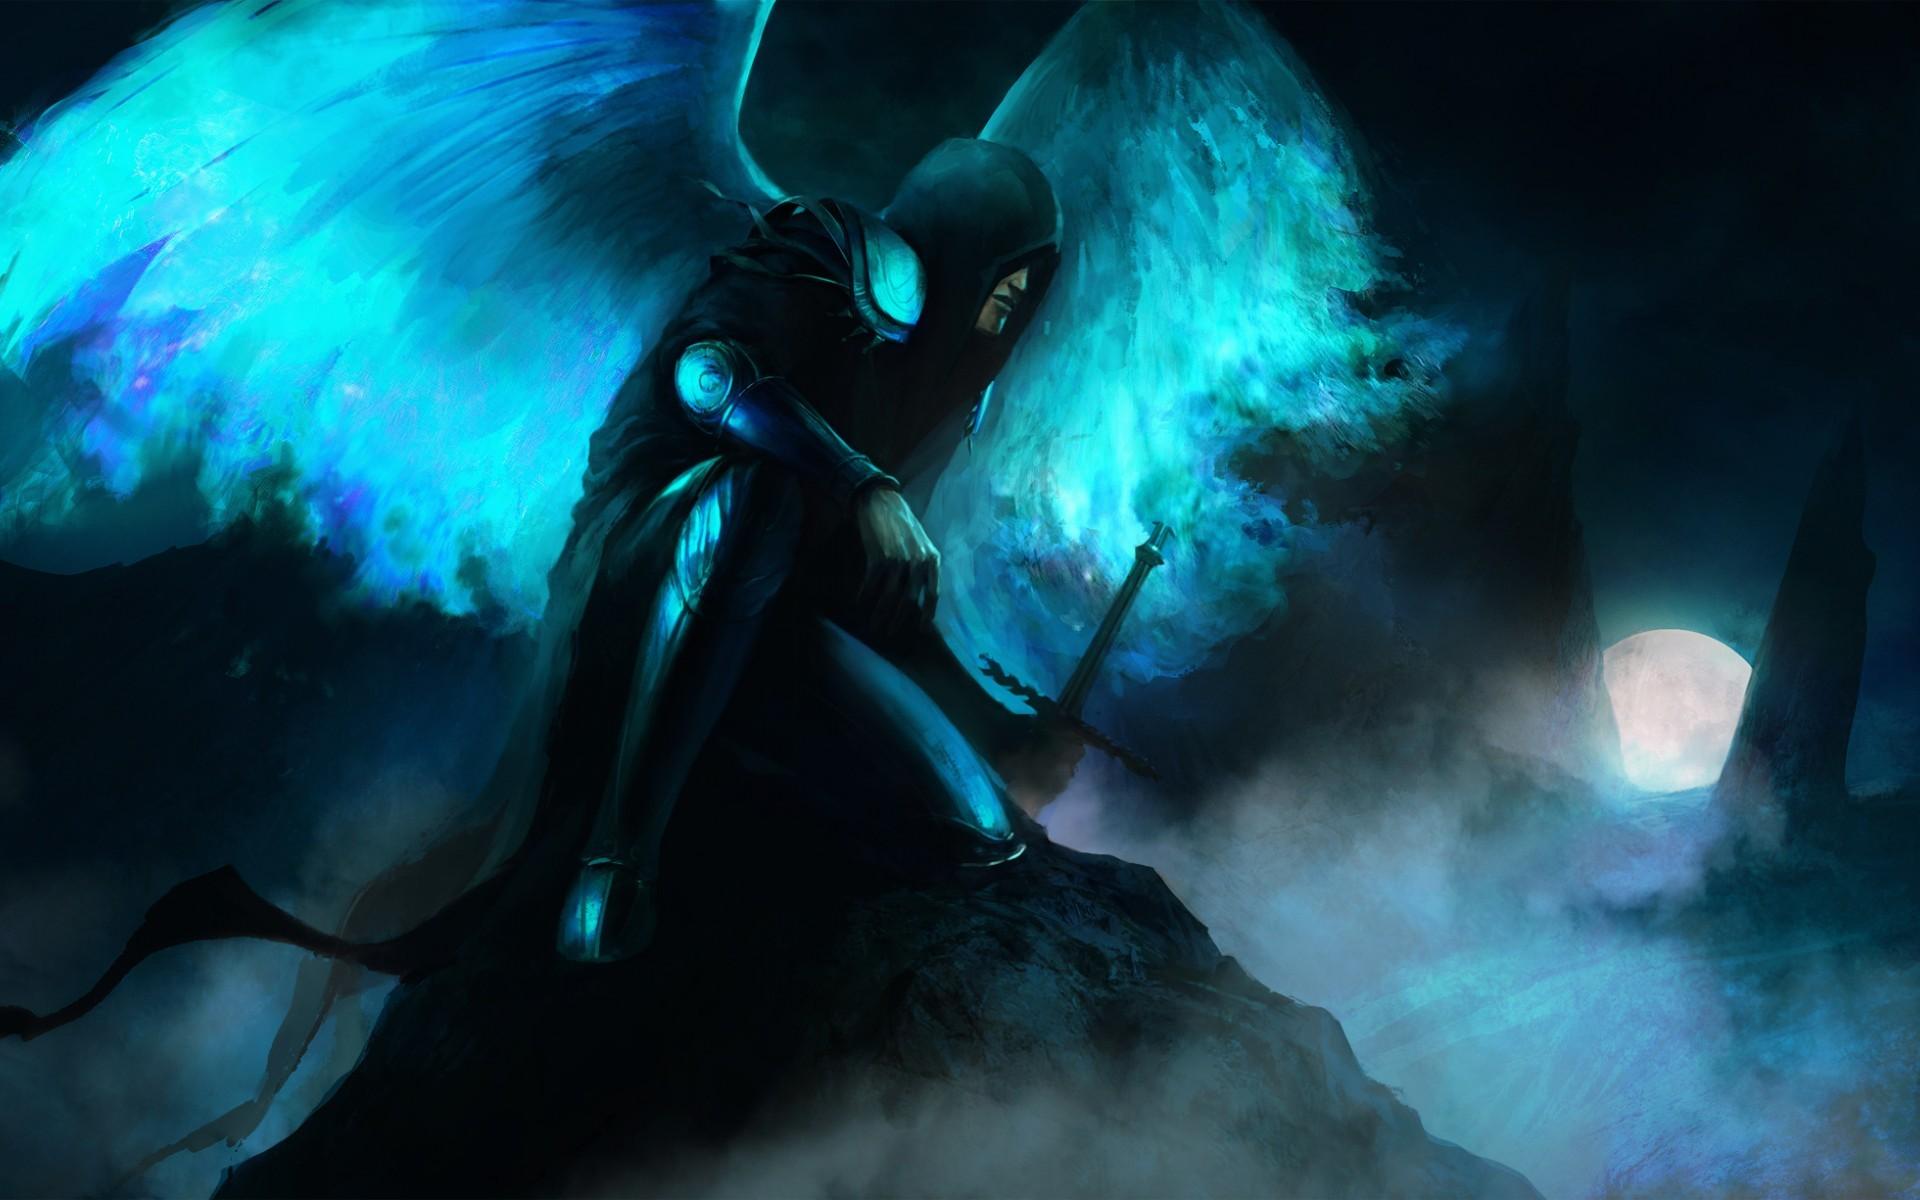 Ангел во тьме картинки аниме